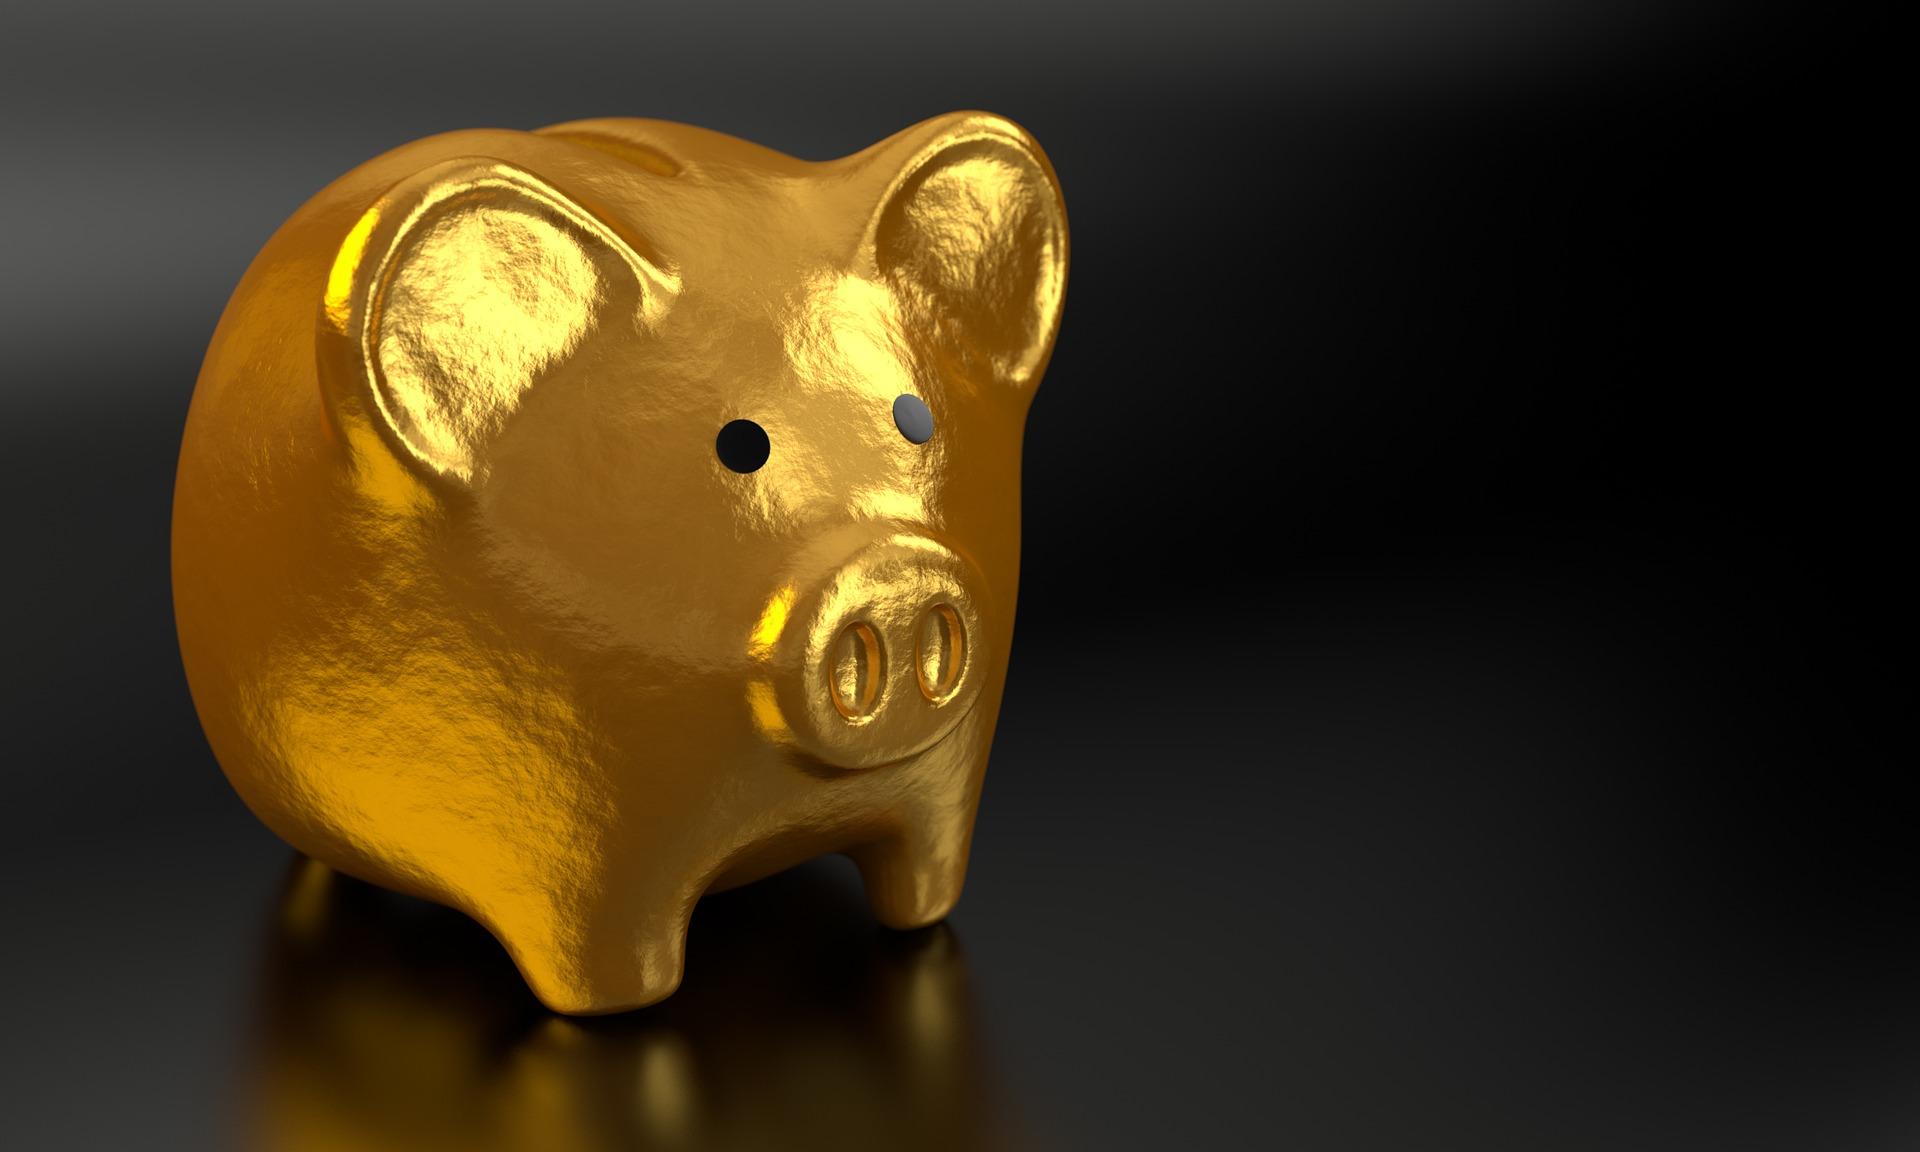 golden piggy bank, retirement accounts, courtesy of Arizona Divorce Lawyer and Daniel J Siegel